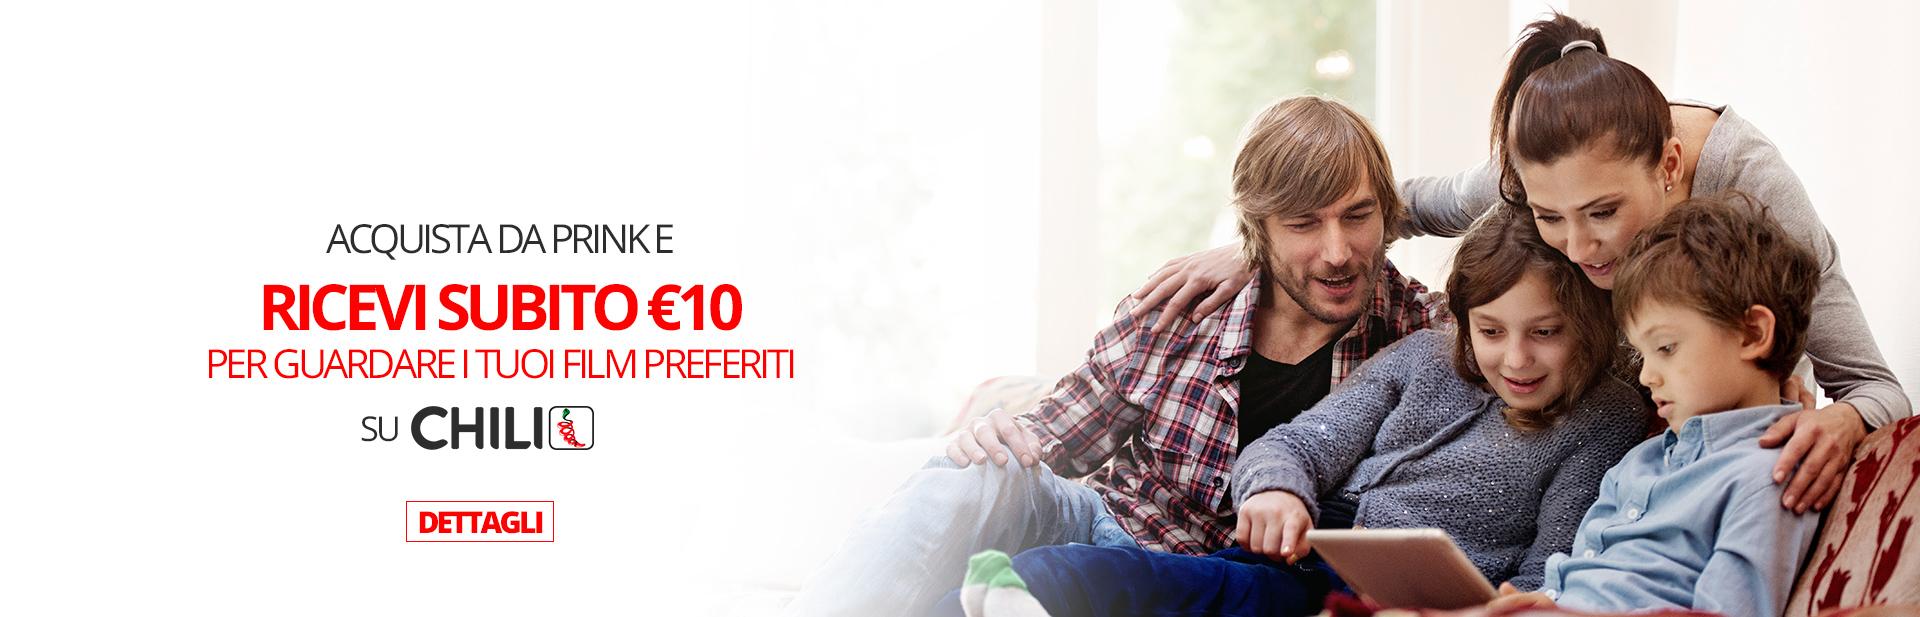 coupon-10-euro-film-streaming-ChiliTV-Prink-SL